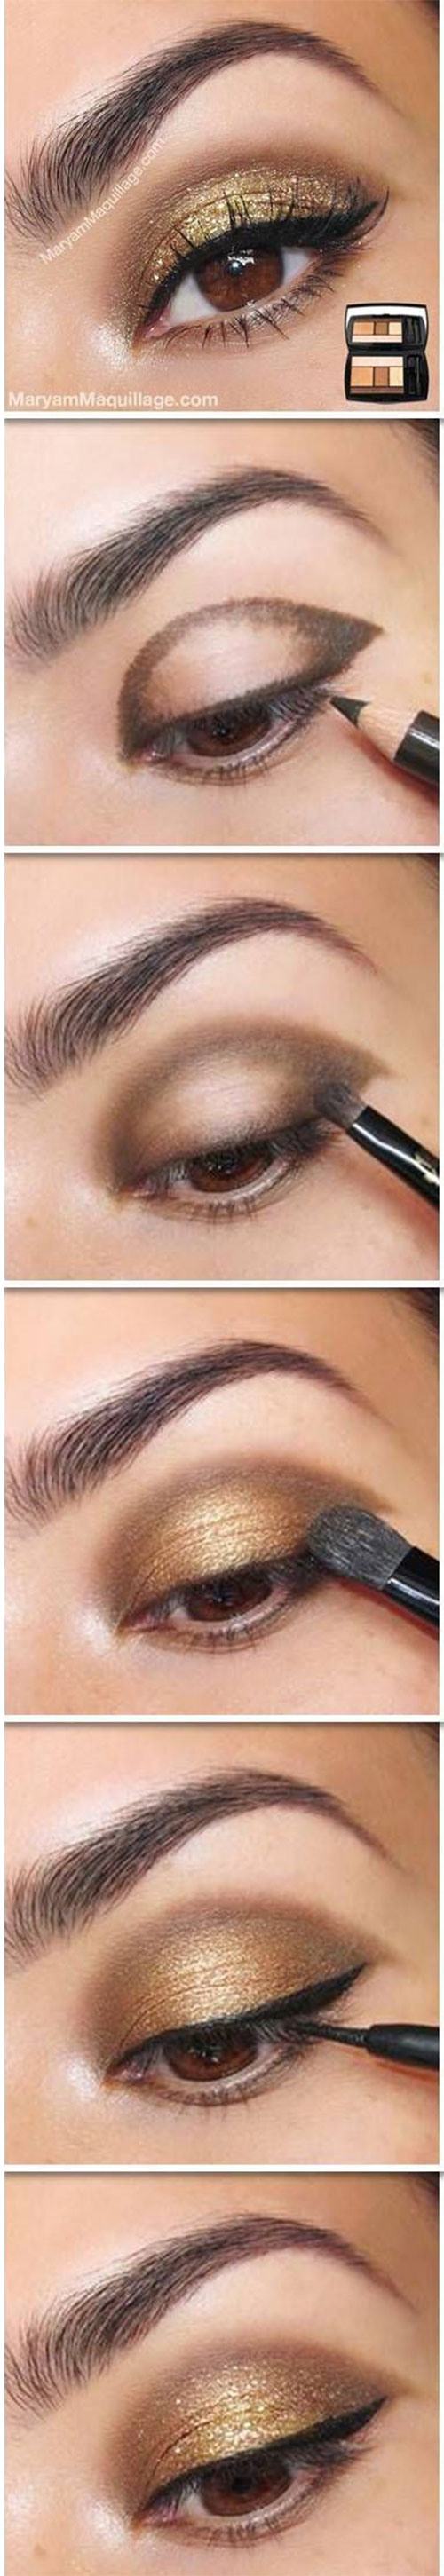 20-Happy-New-Year-Eve-Eye-Makeup-Tutorial-2015-9